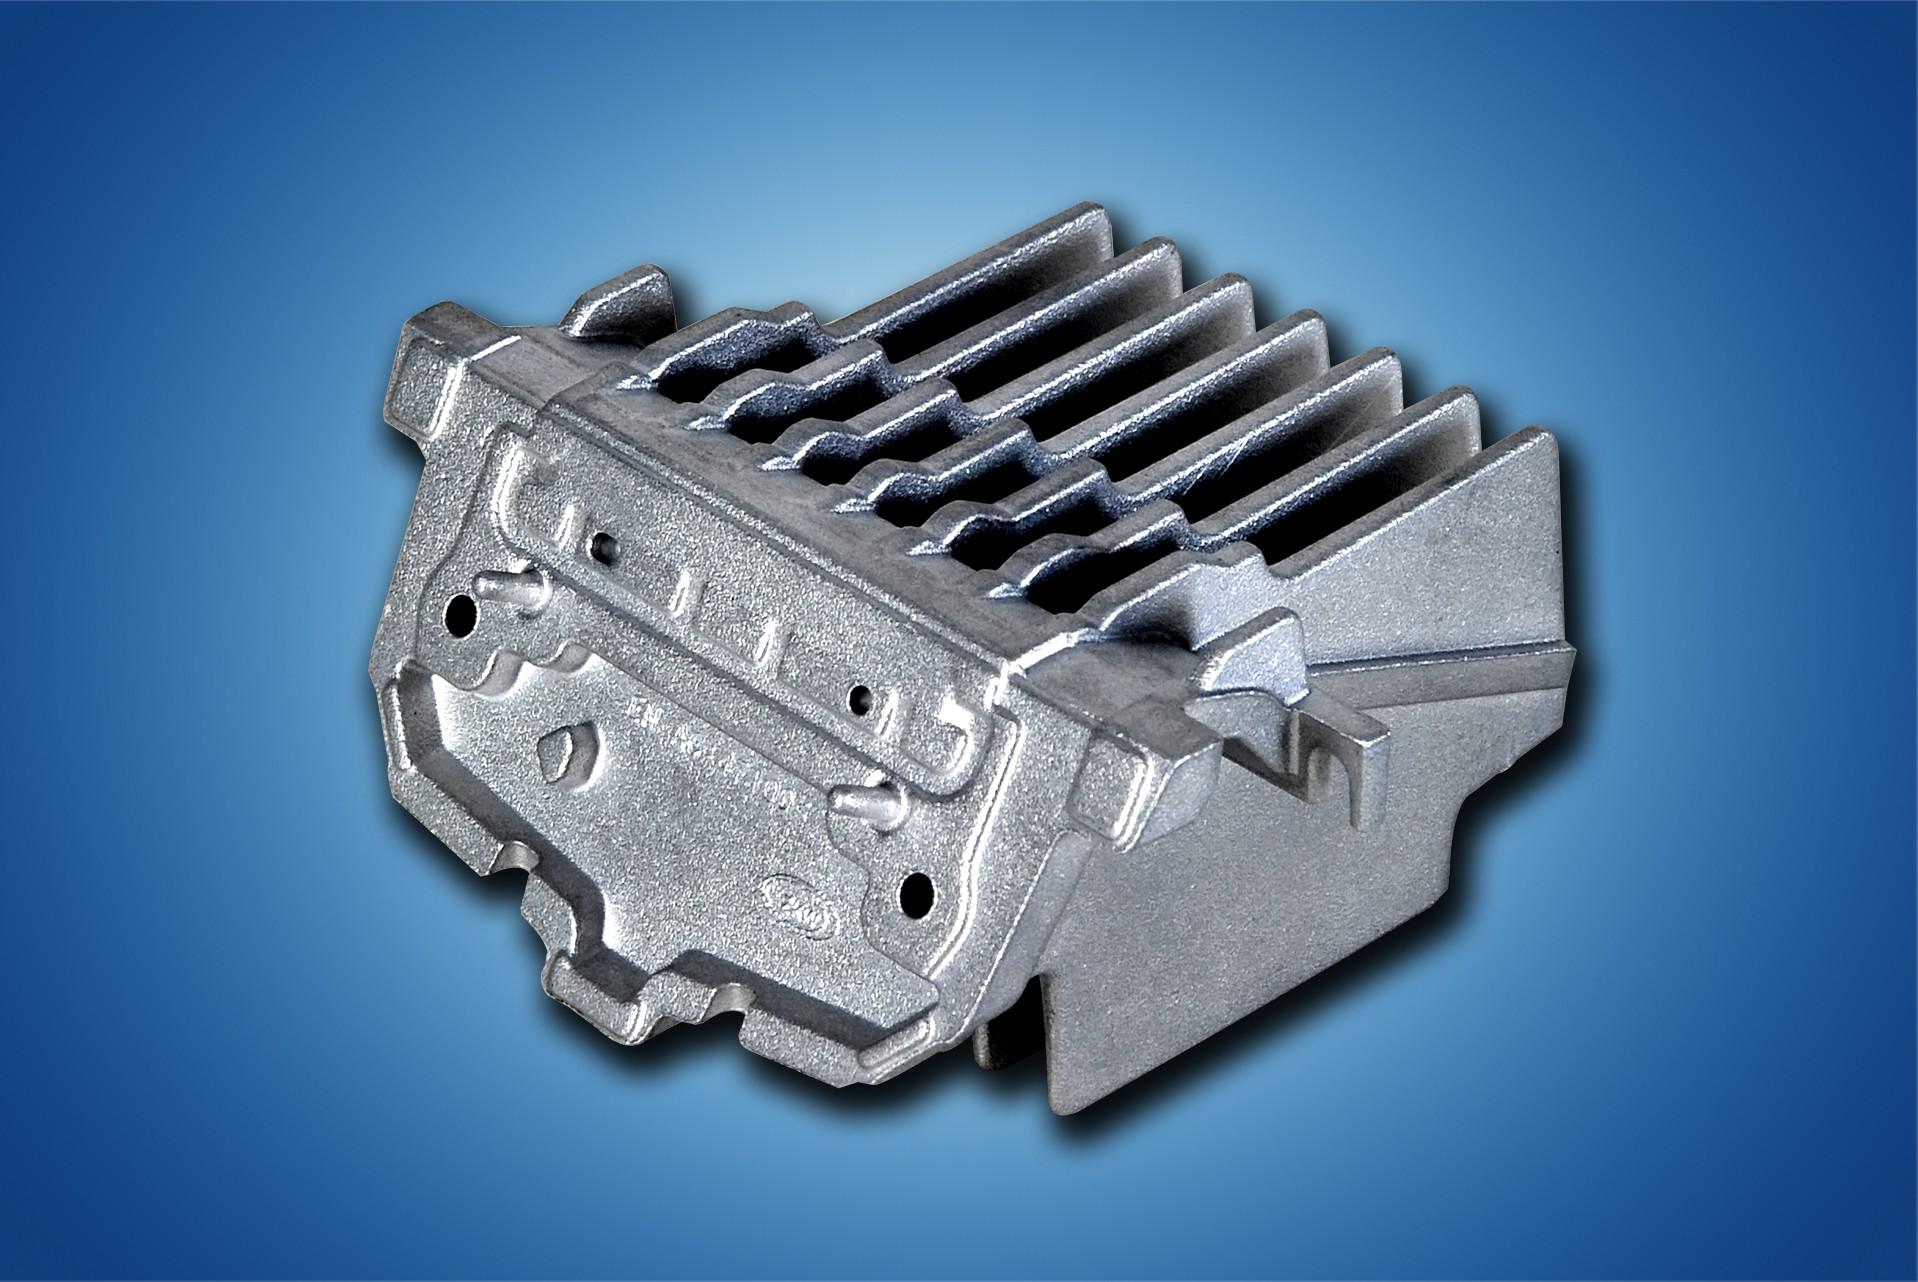 Ero-Projekt-d.o.o.-Toolshop-Werkzeugbau-die-cast-tool-3-attco